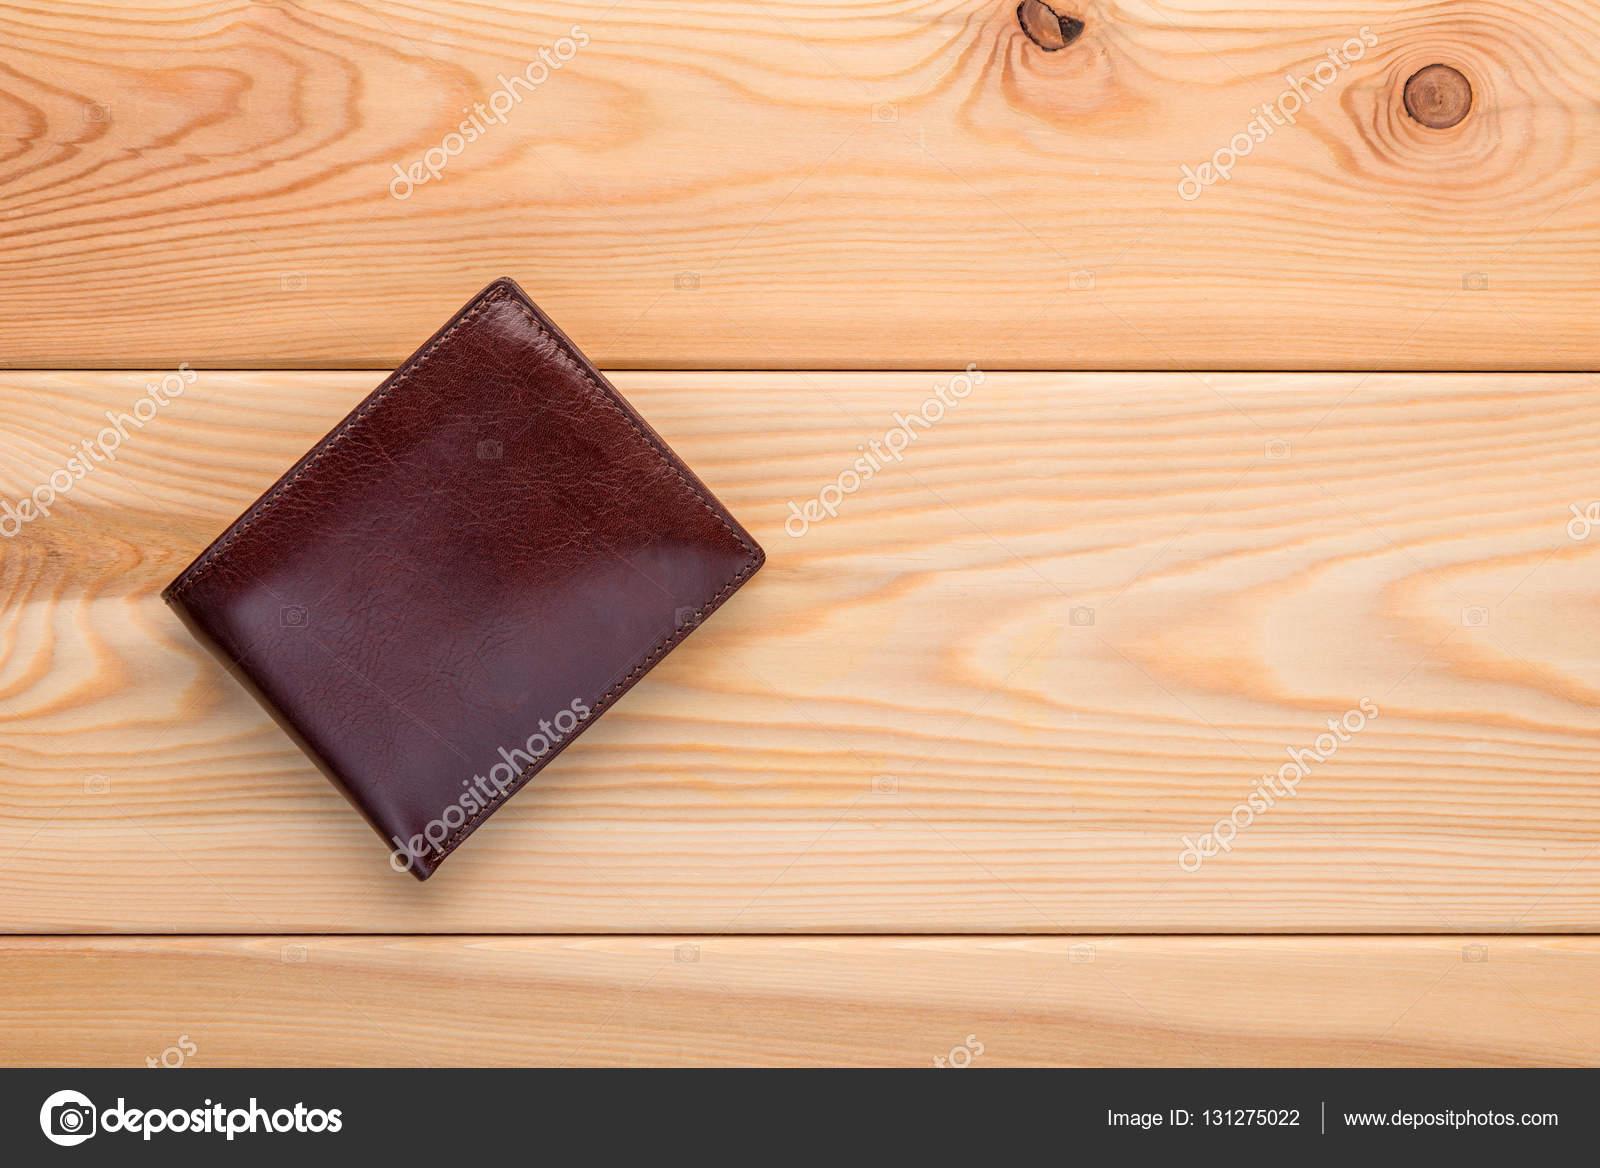 85e5c70a4f Ανδρικό κλασικό πορτοφόλι καφέ χρώμα σε το closeup ξύλινο πάτωμα– εικόνα  αρχείου